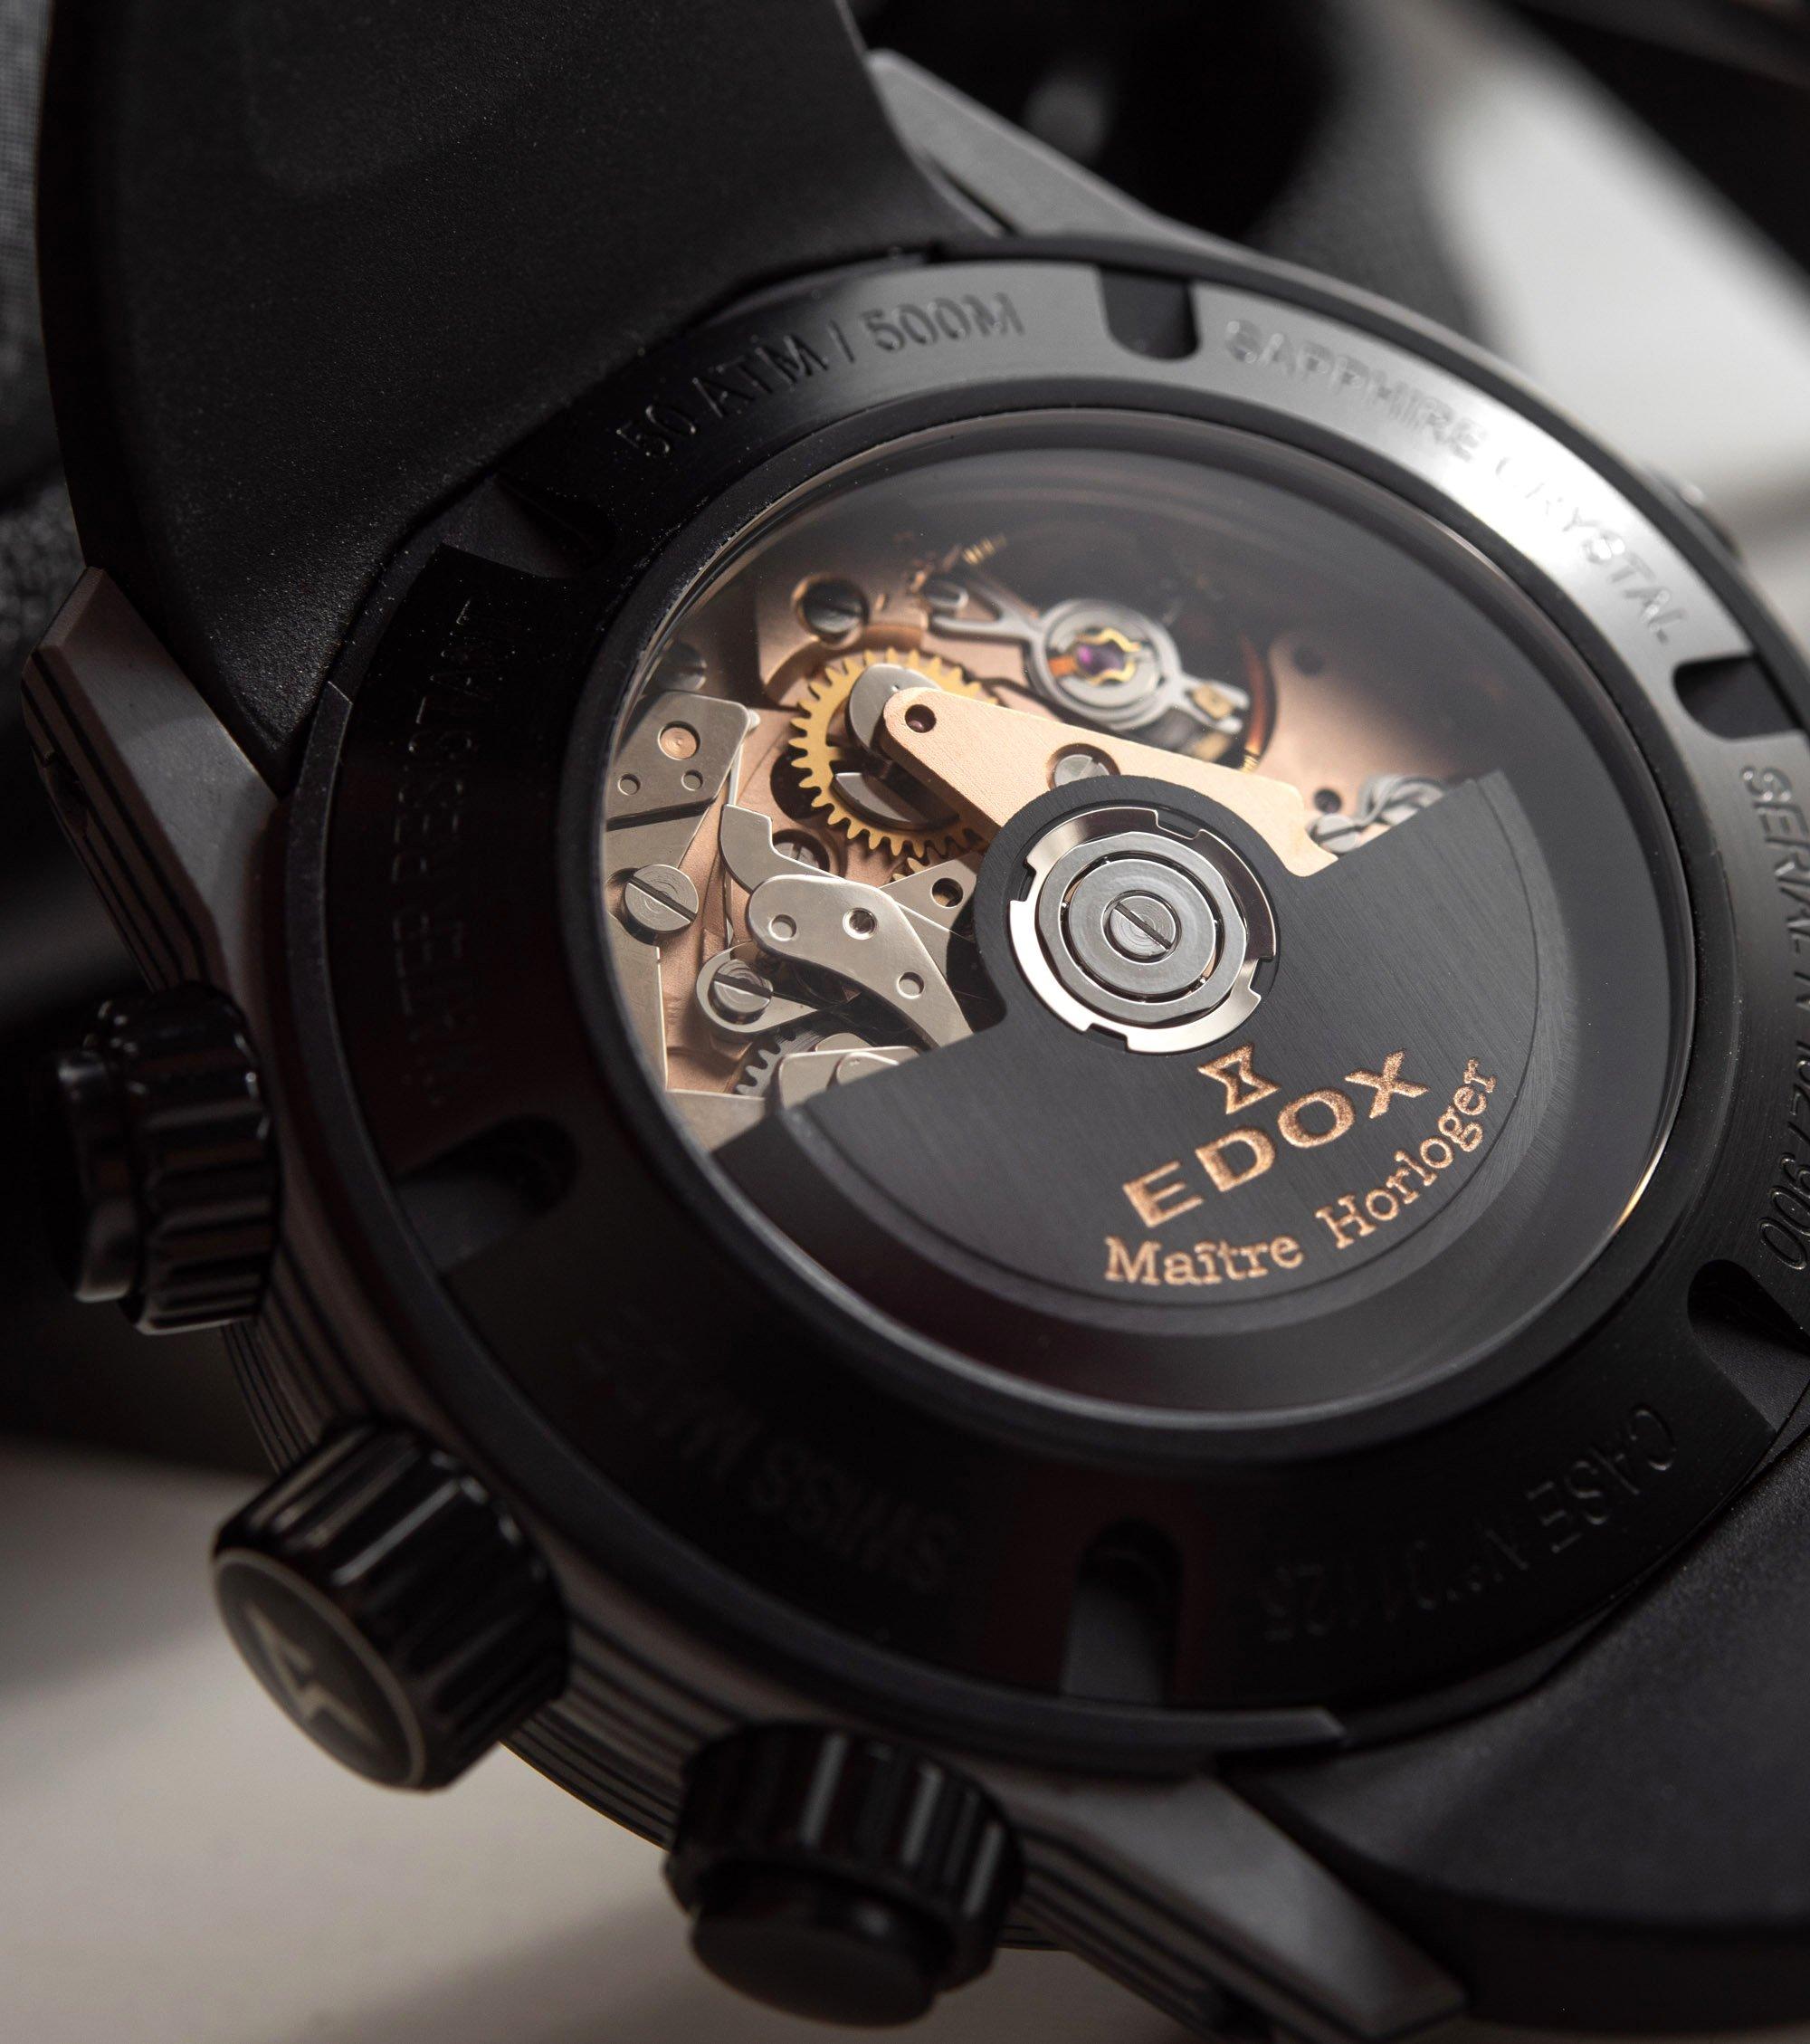 Обзор часов: Edox CO-1 Carbon Chronograph